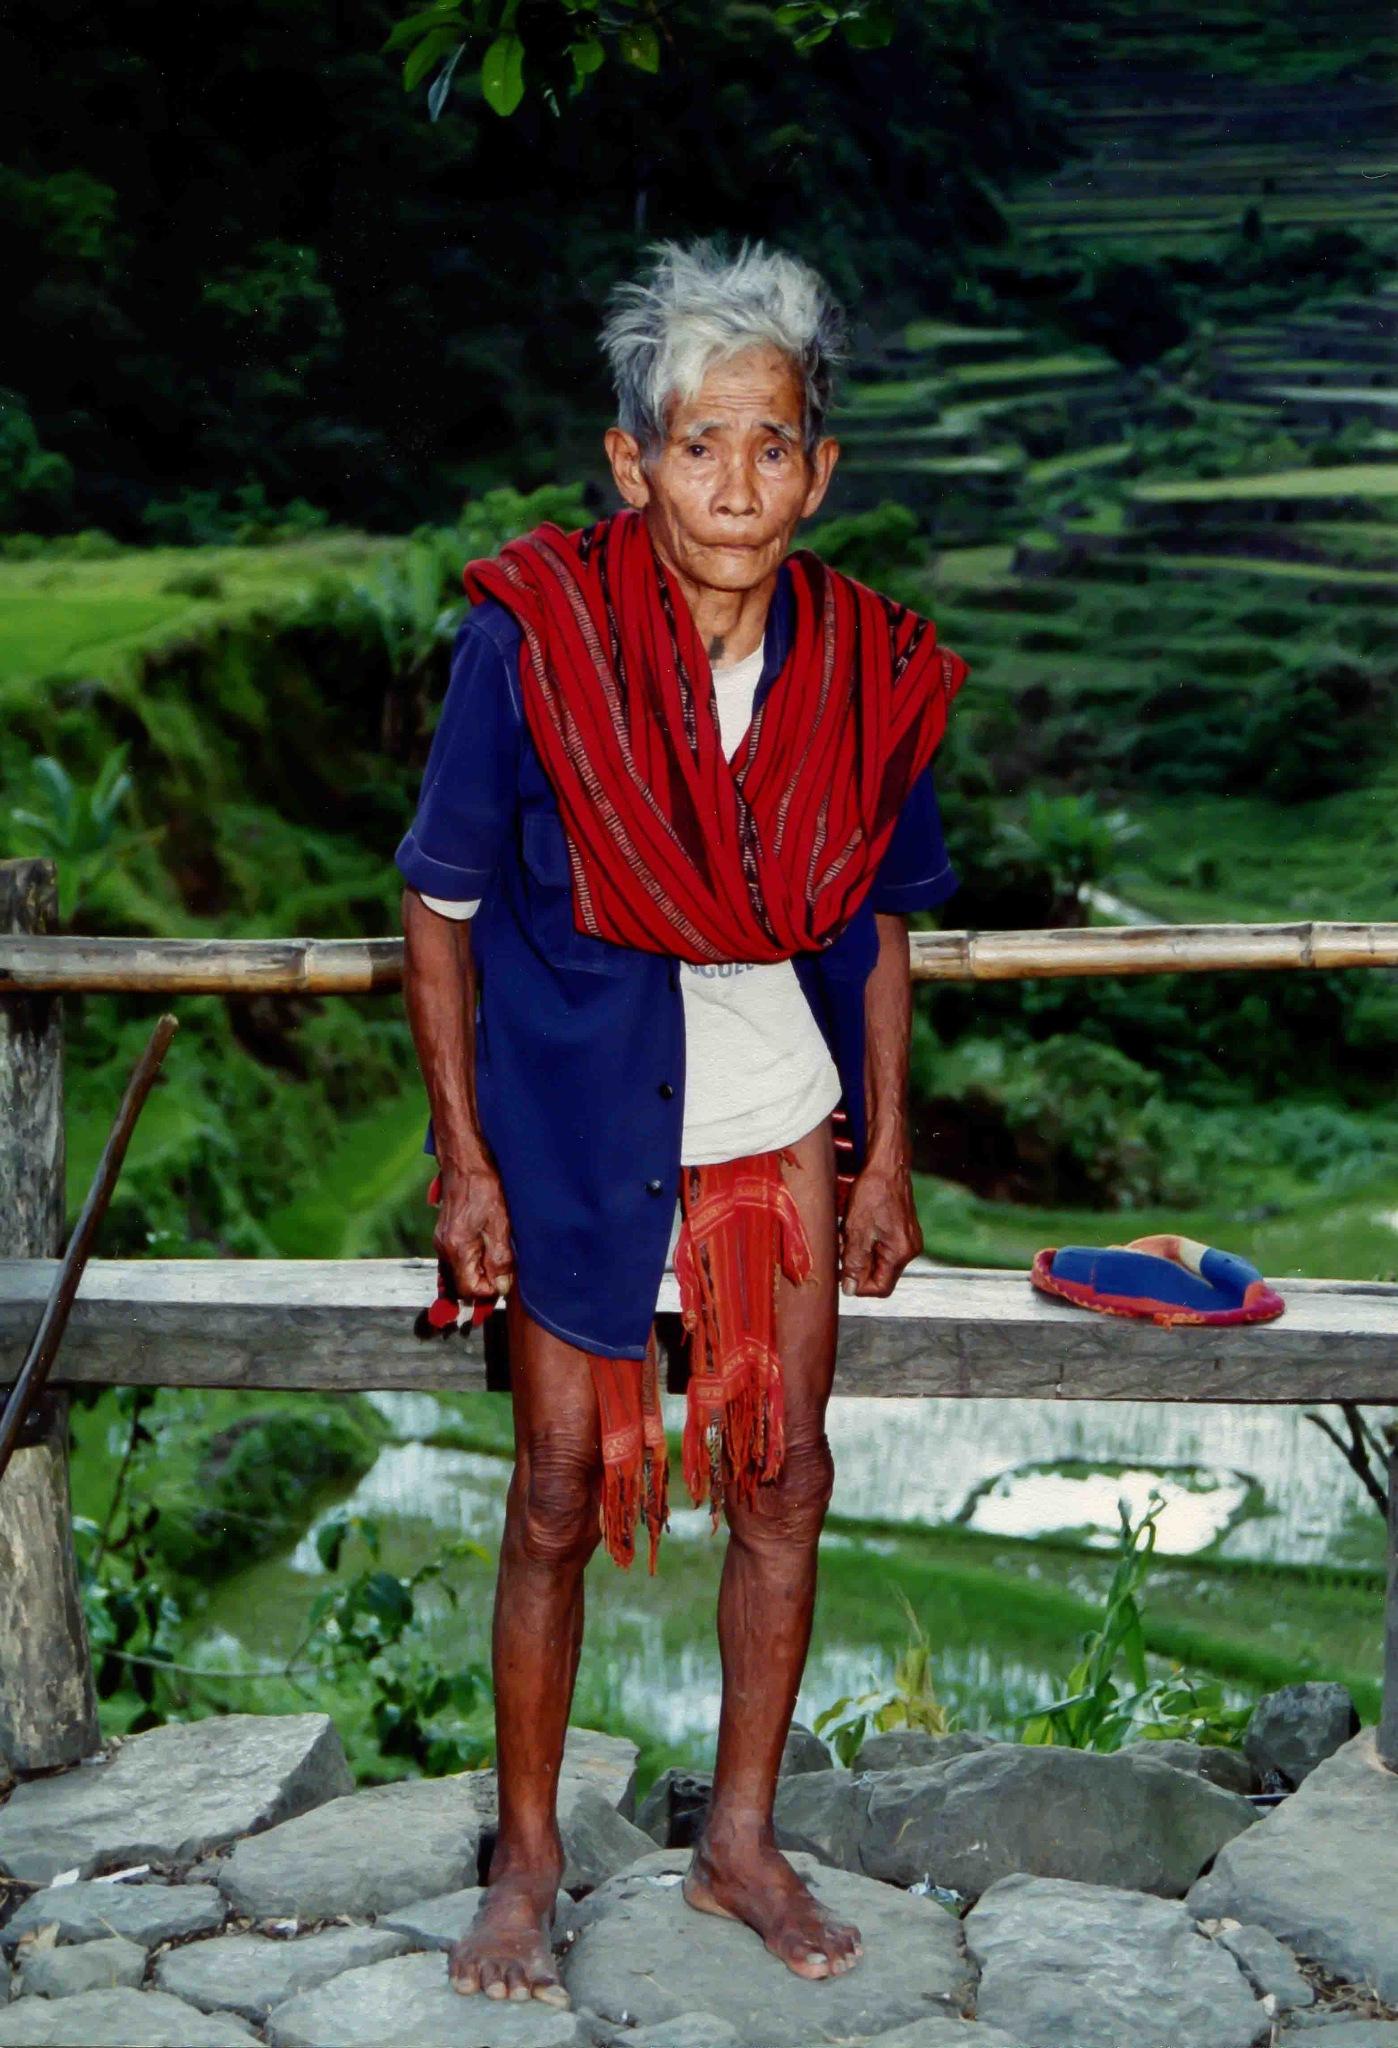 Man of Banaue by kpharney